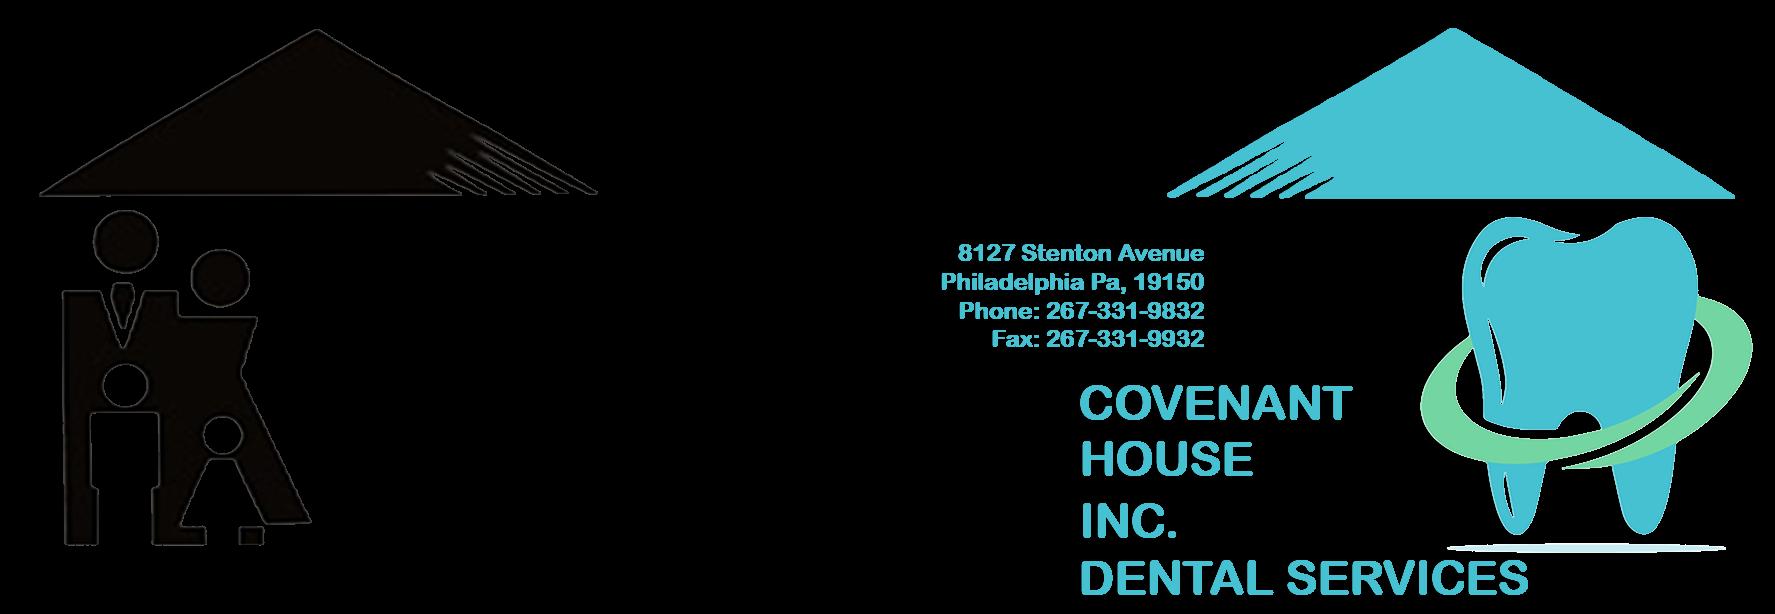 Covenant House Inc.